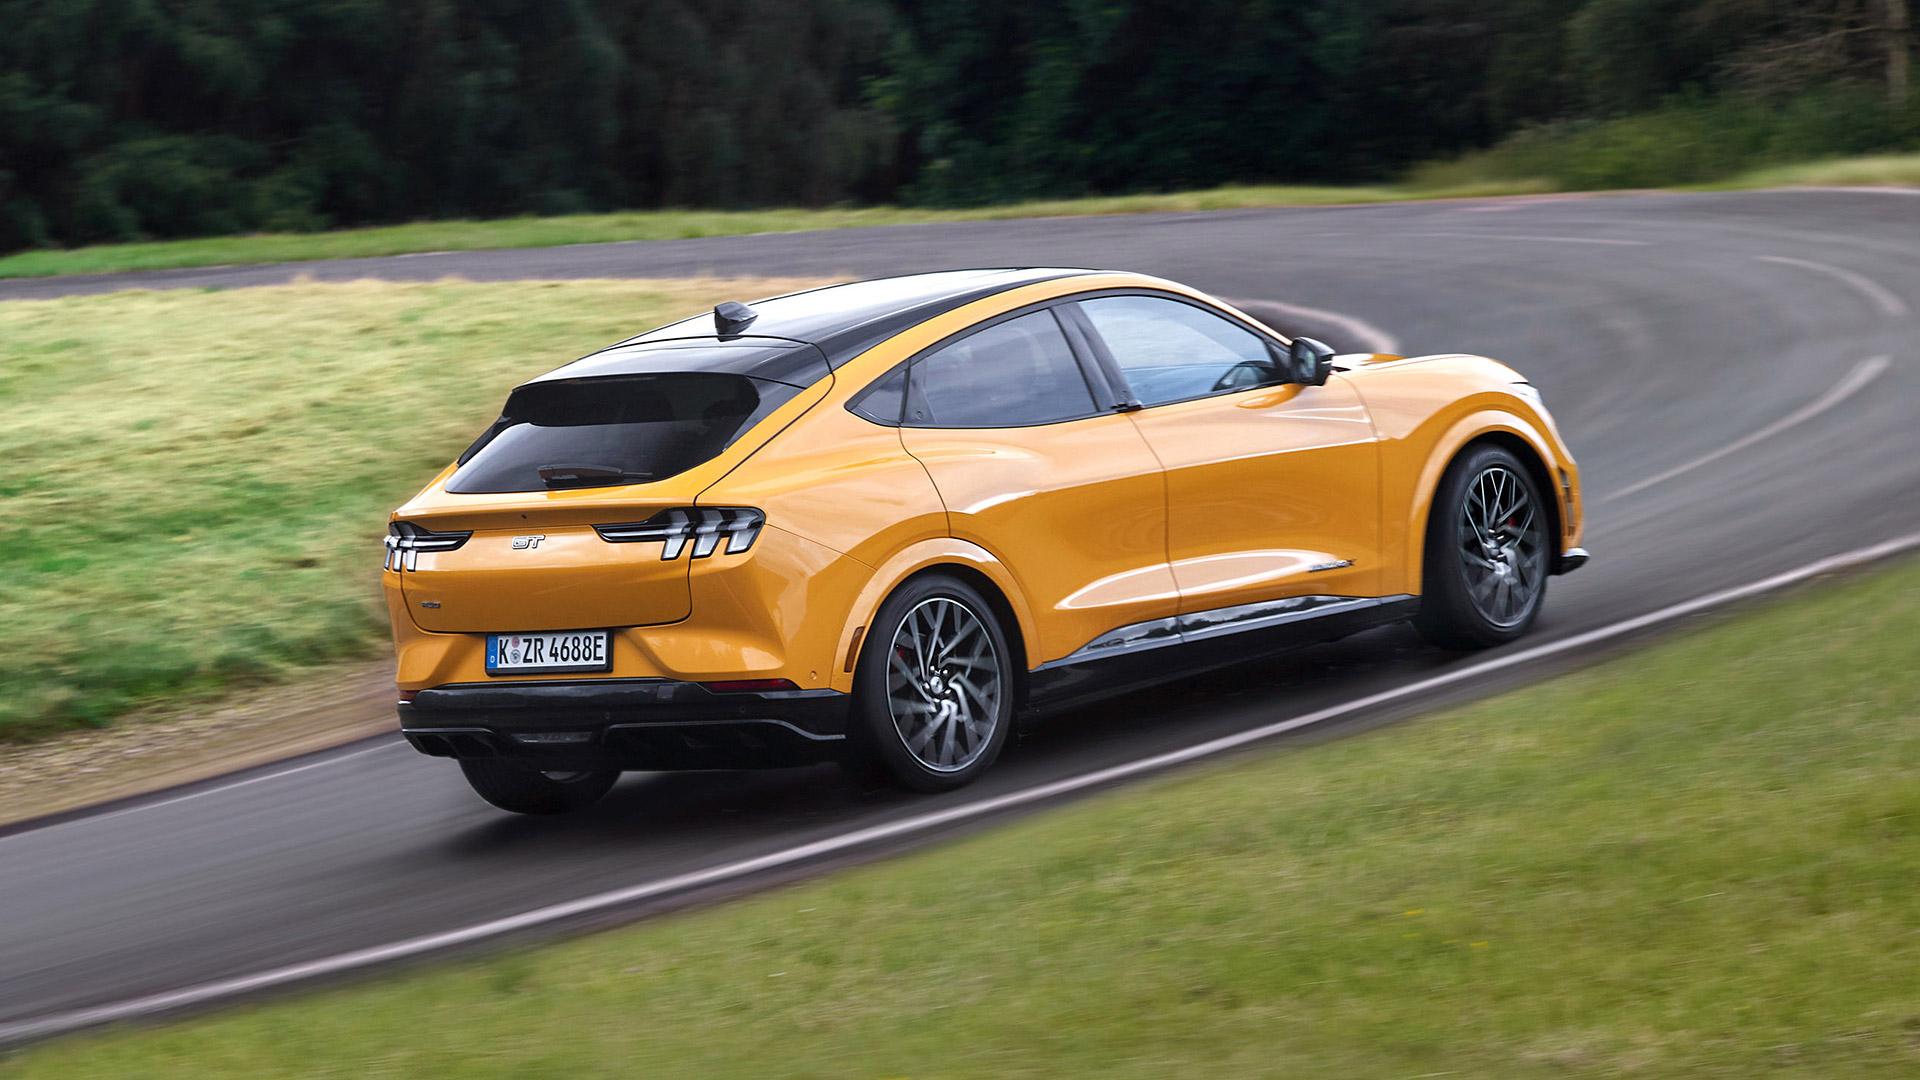 Mustang Mach-E GT: Η πιο σπορ και συναρπαστική έκδοση του ηλεκτρικού SUV (pics)